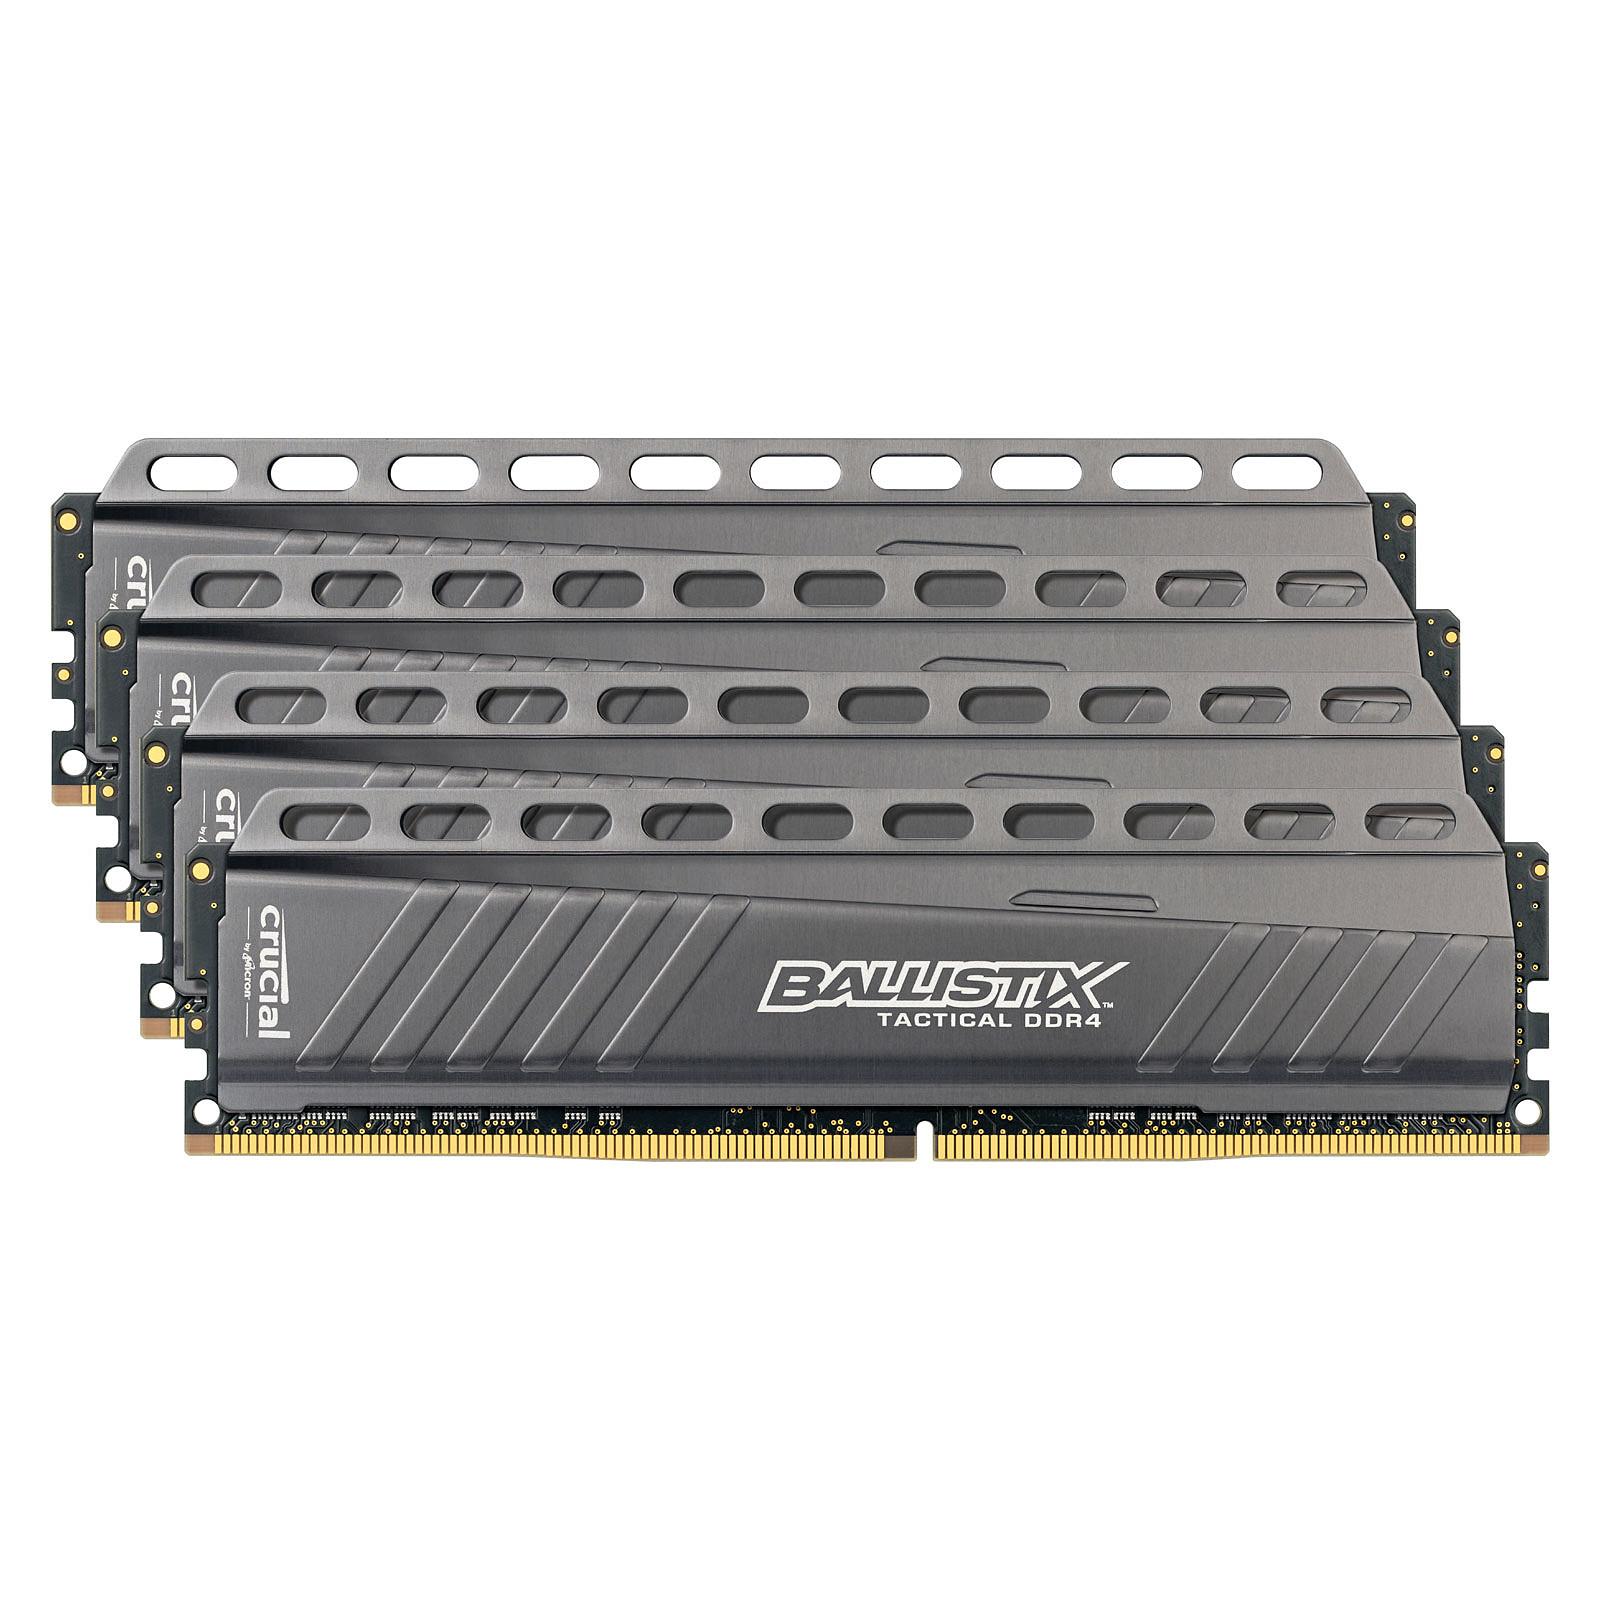 Ballistix Tactical 16 Go (4 x 4 Go) DDR4 2666 MHz CL16